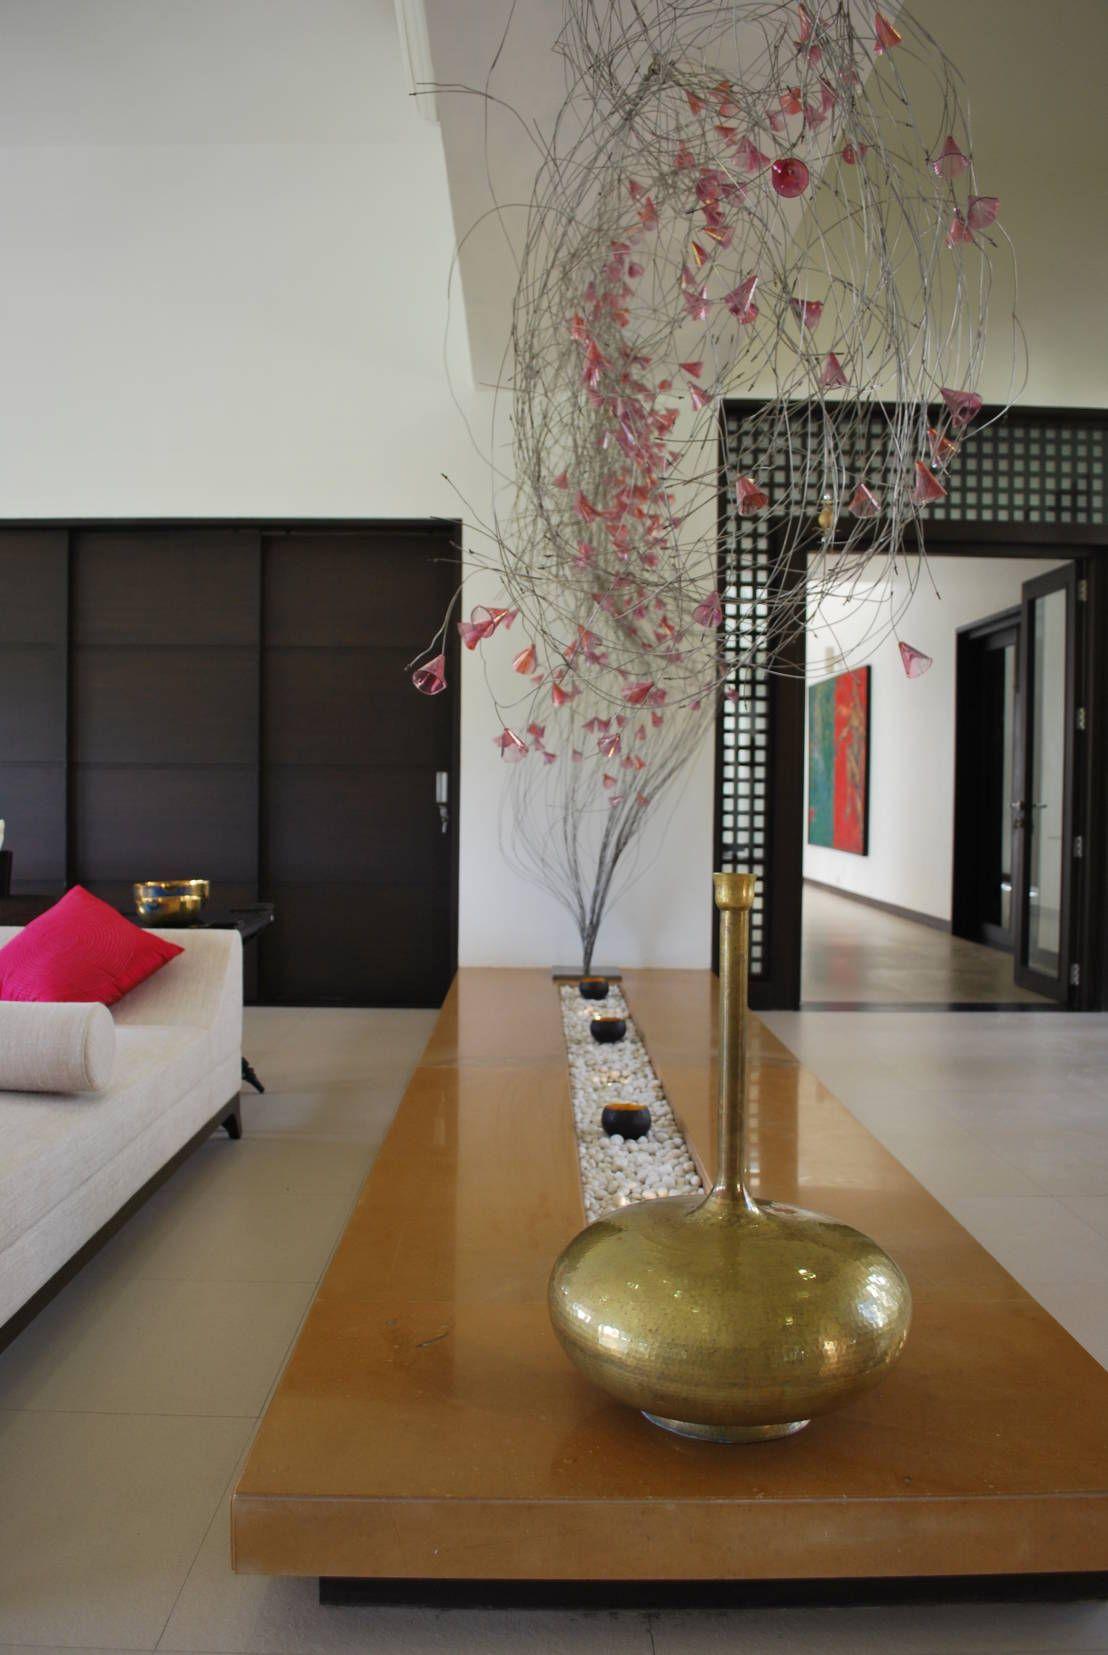 spelndid house and room design. Room A splendid house with lavish displays  Modern living rooms